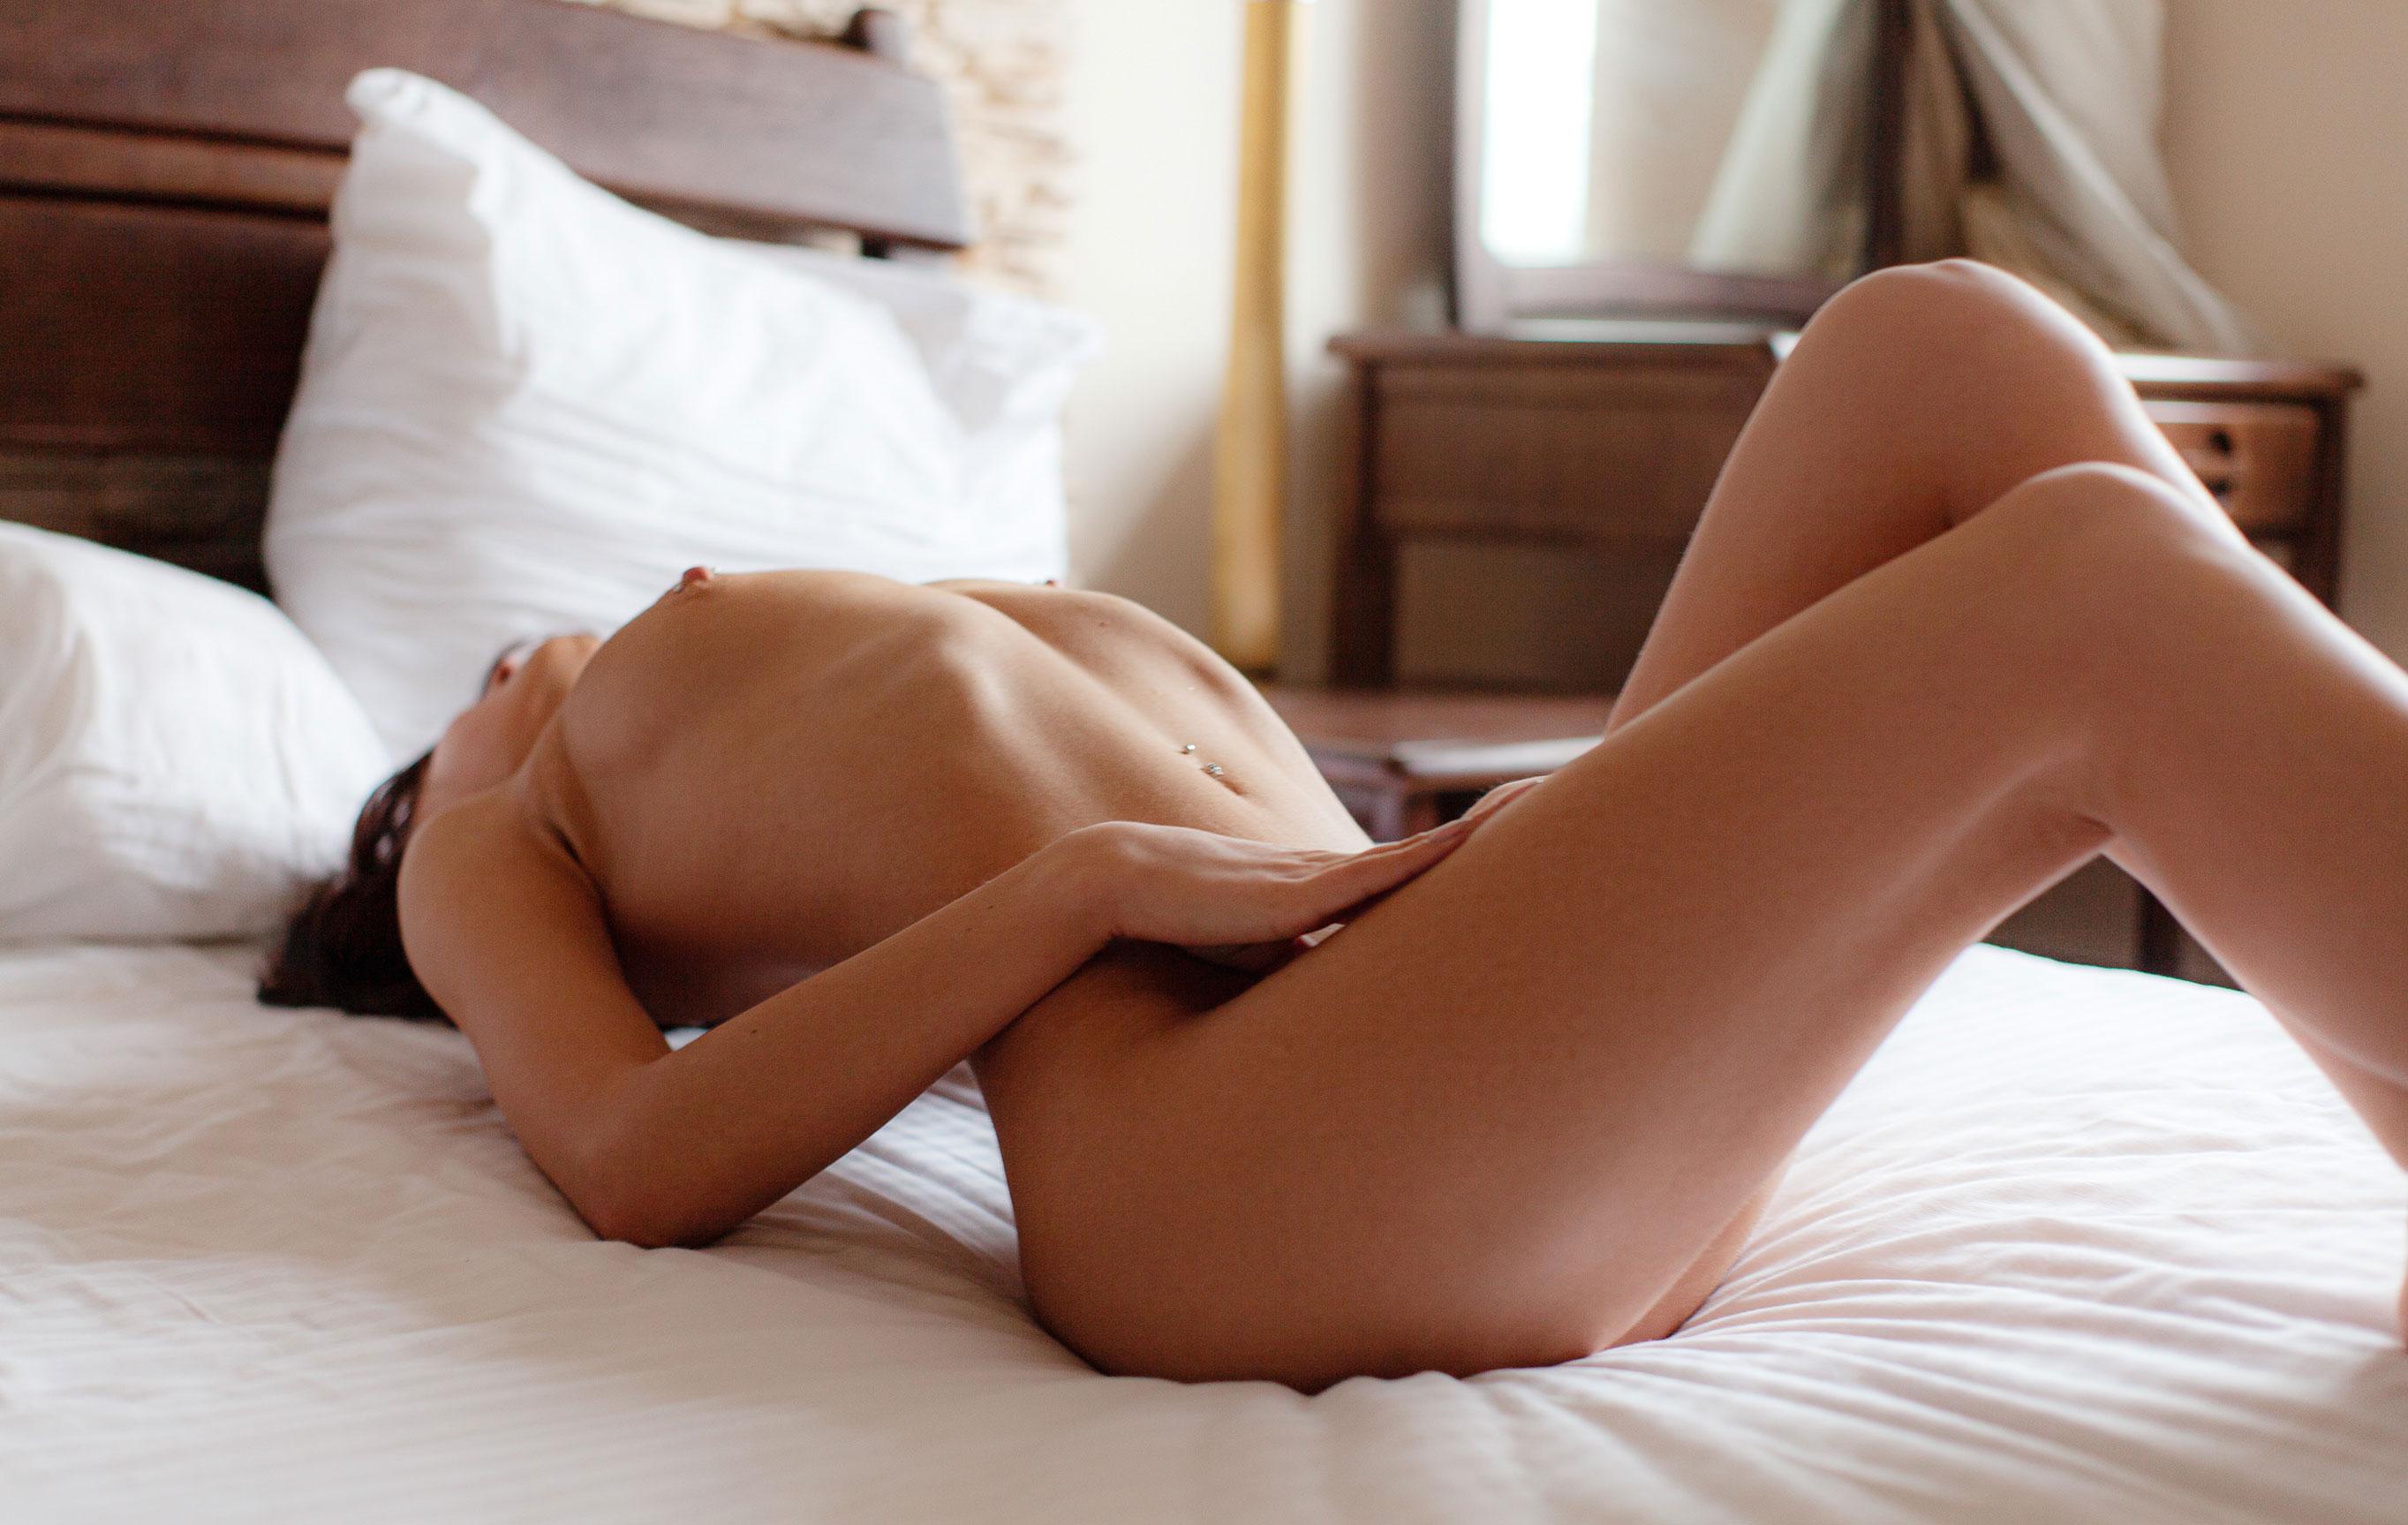 Сексуальная голая девушка на белых простынях / фото 07